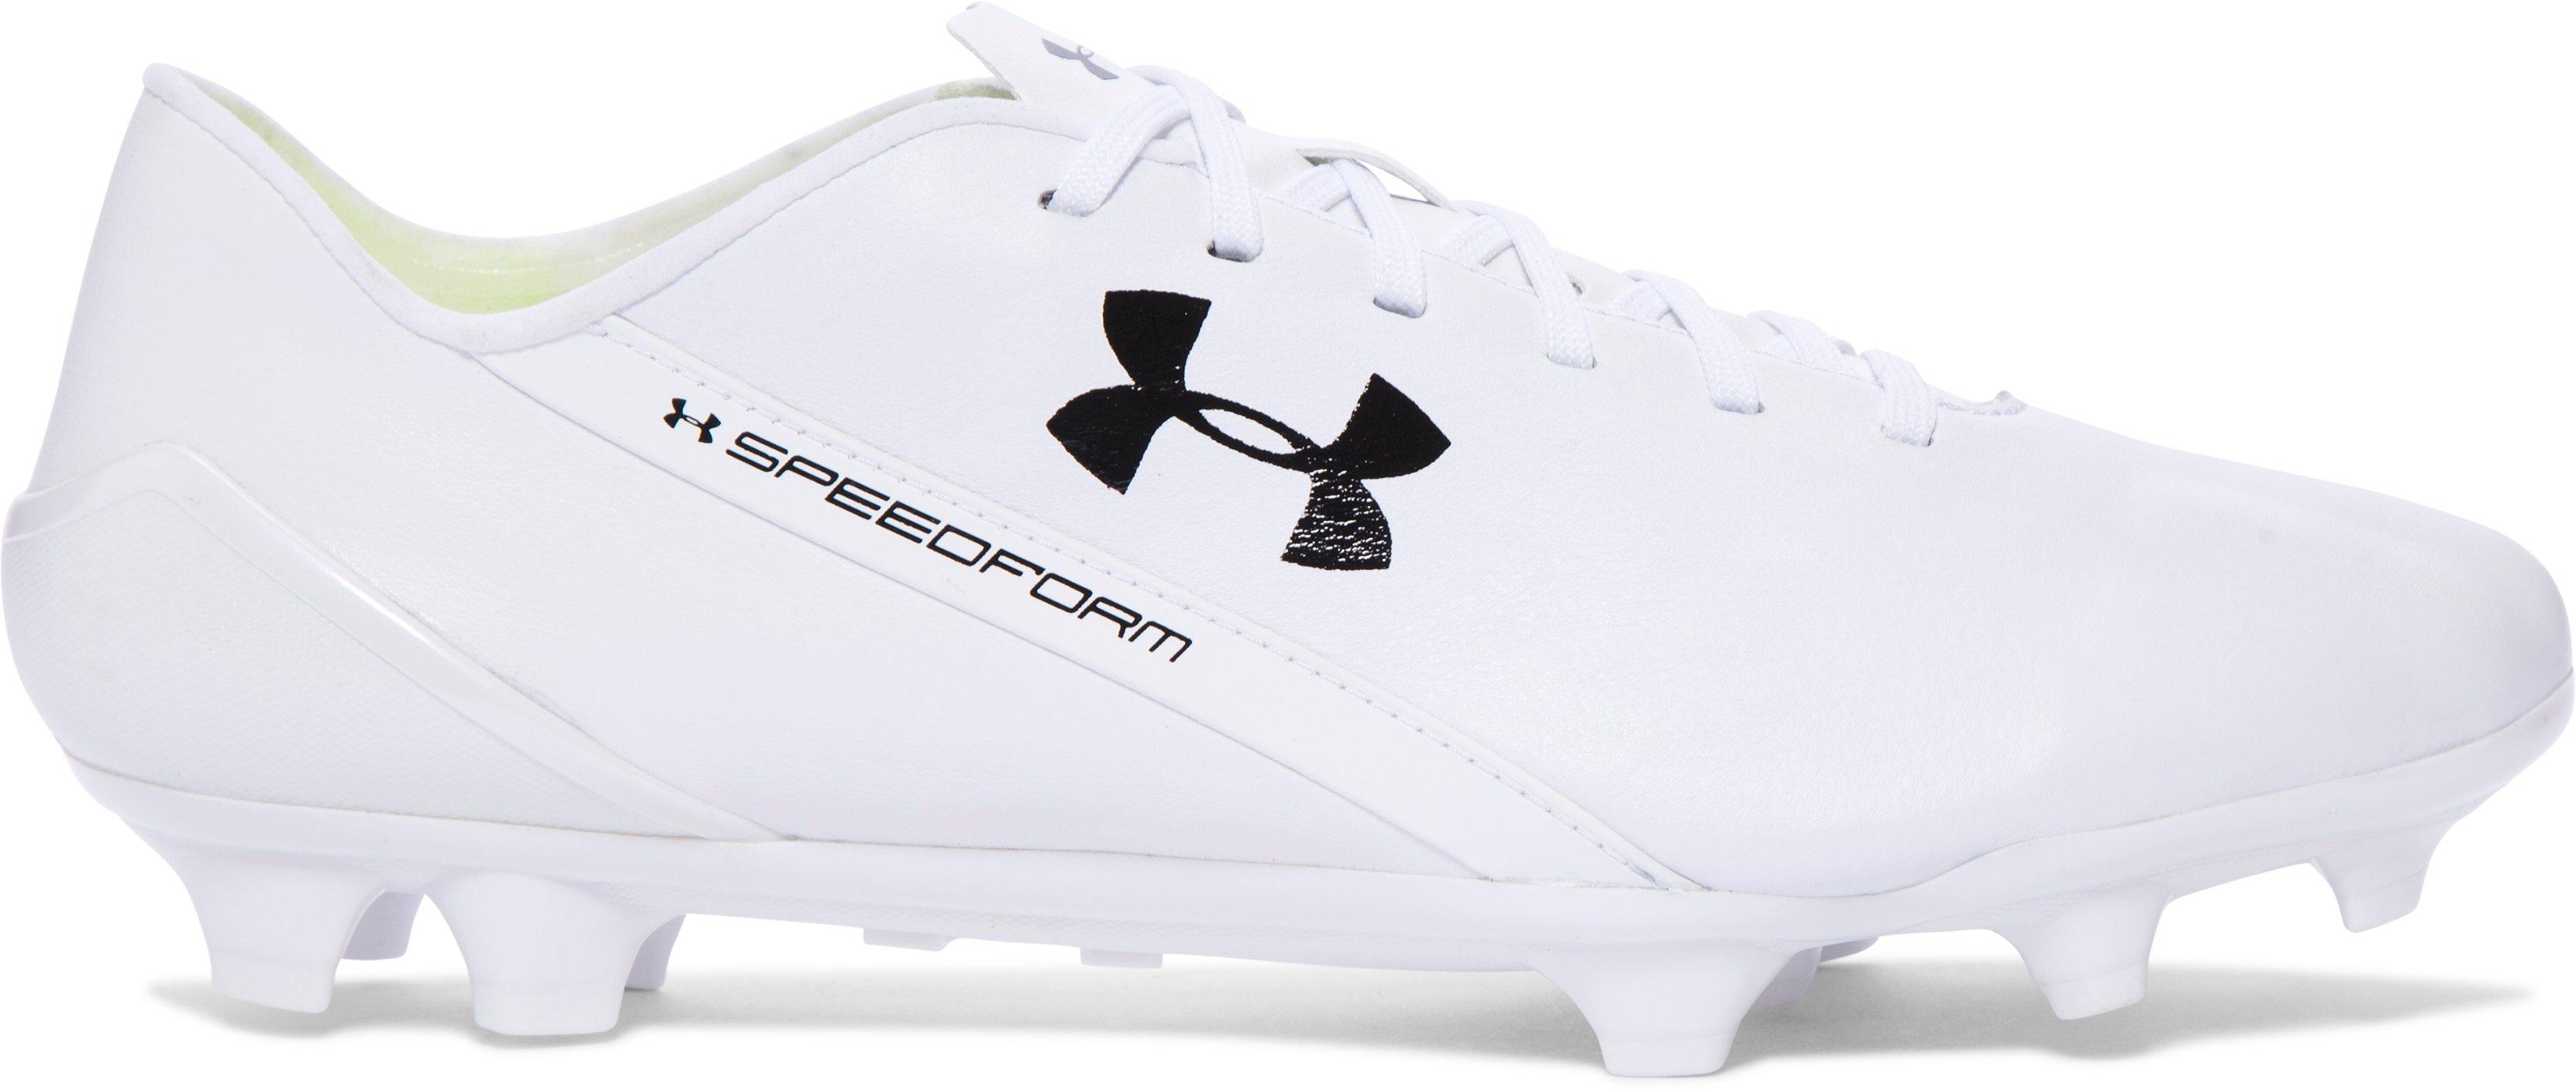 soccer footwear under armour us